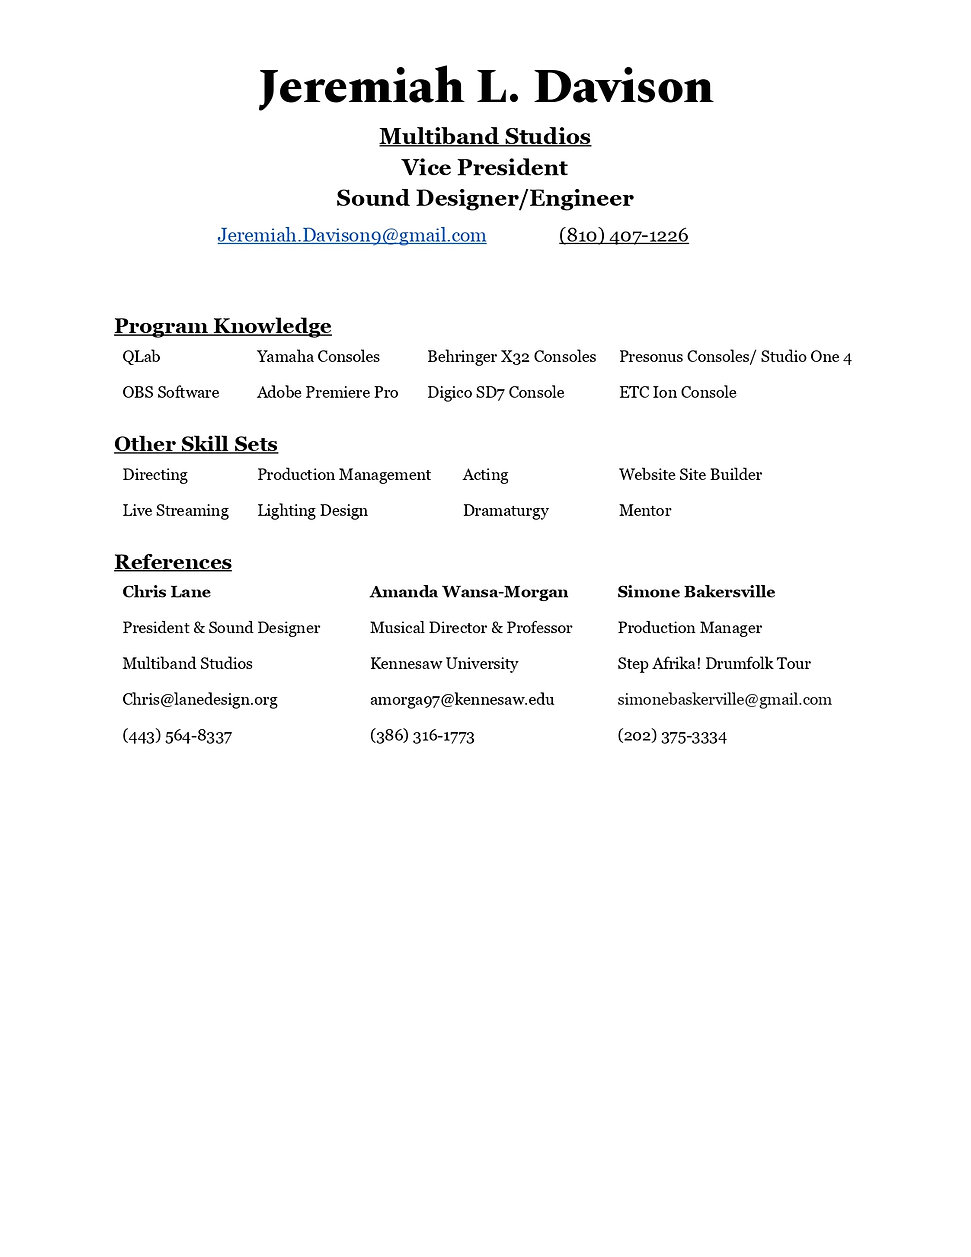 Sound Design Resume- 2020_page-0002.jpg